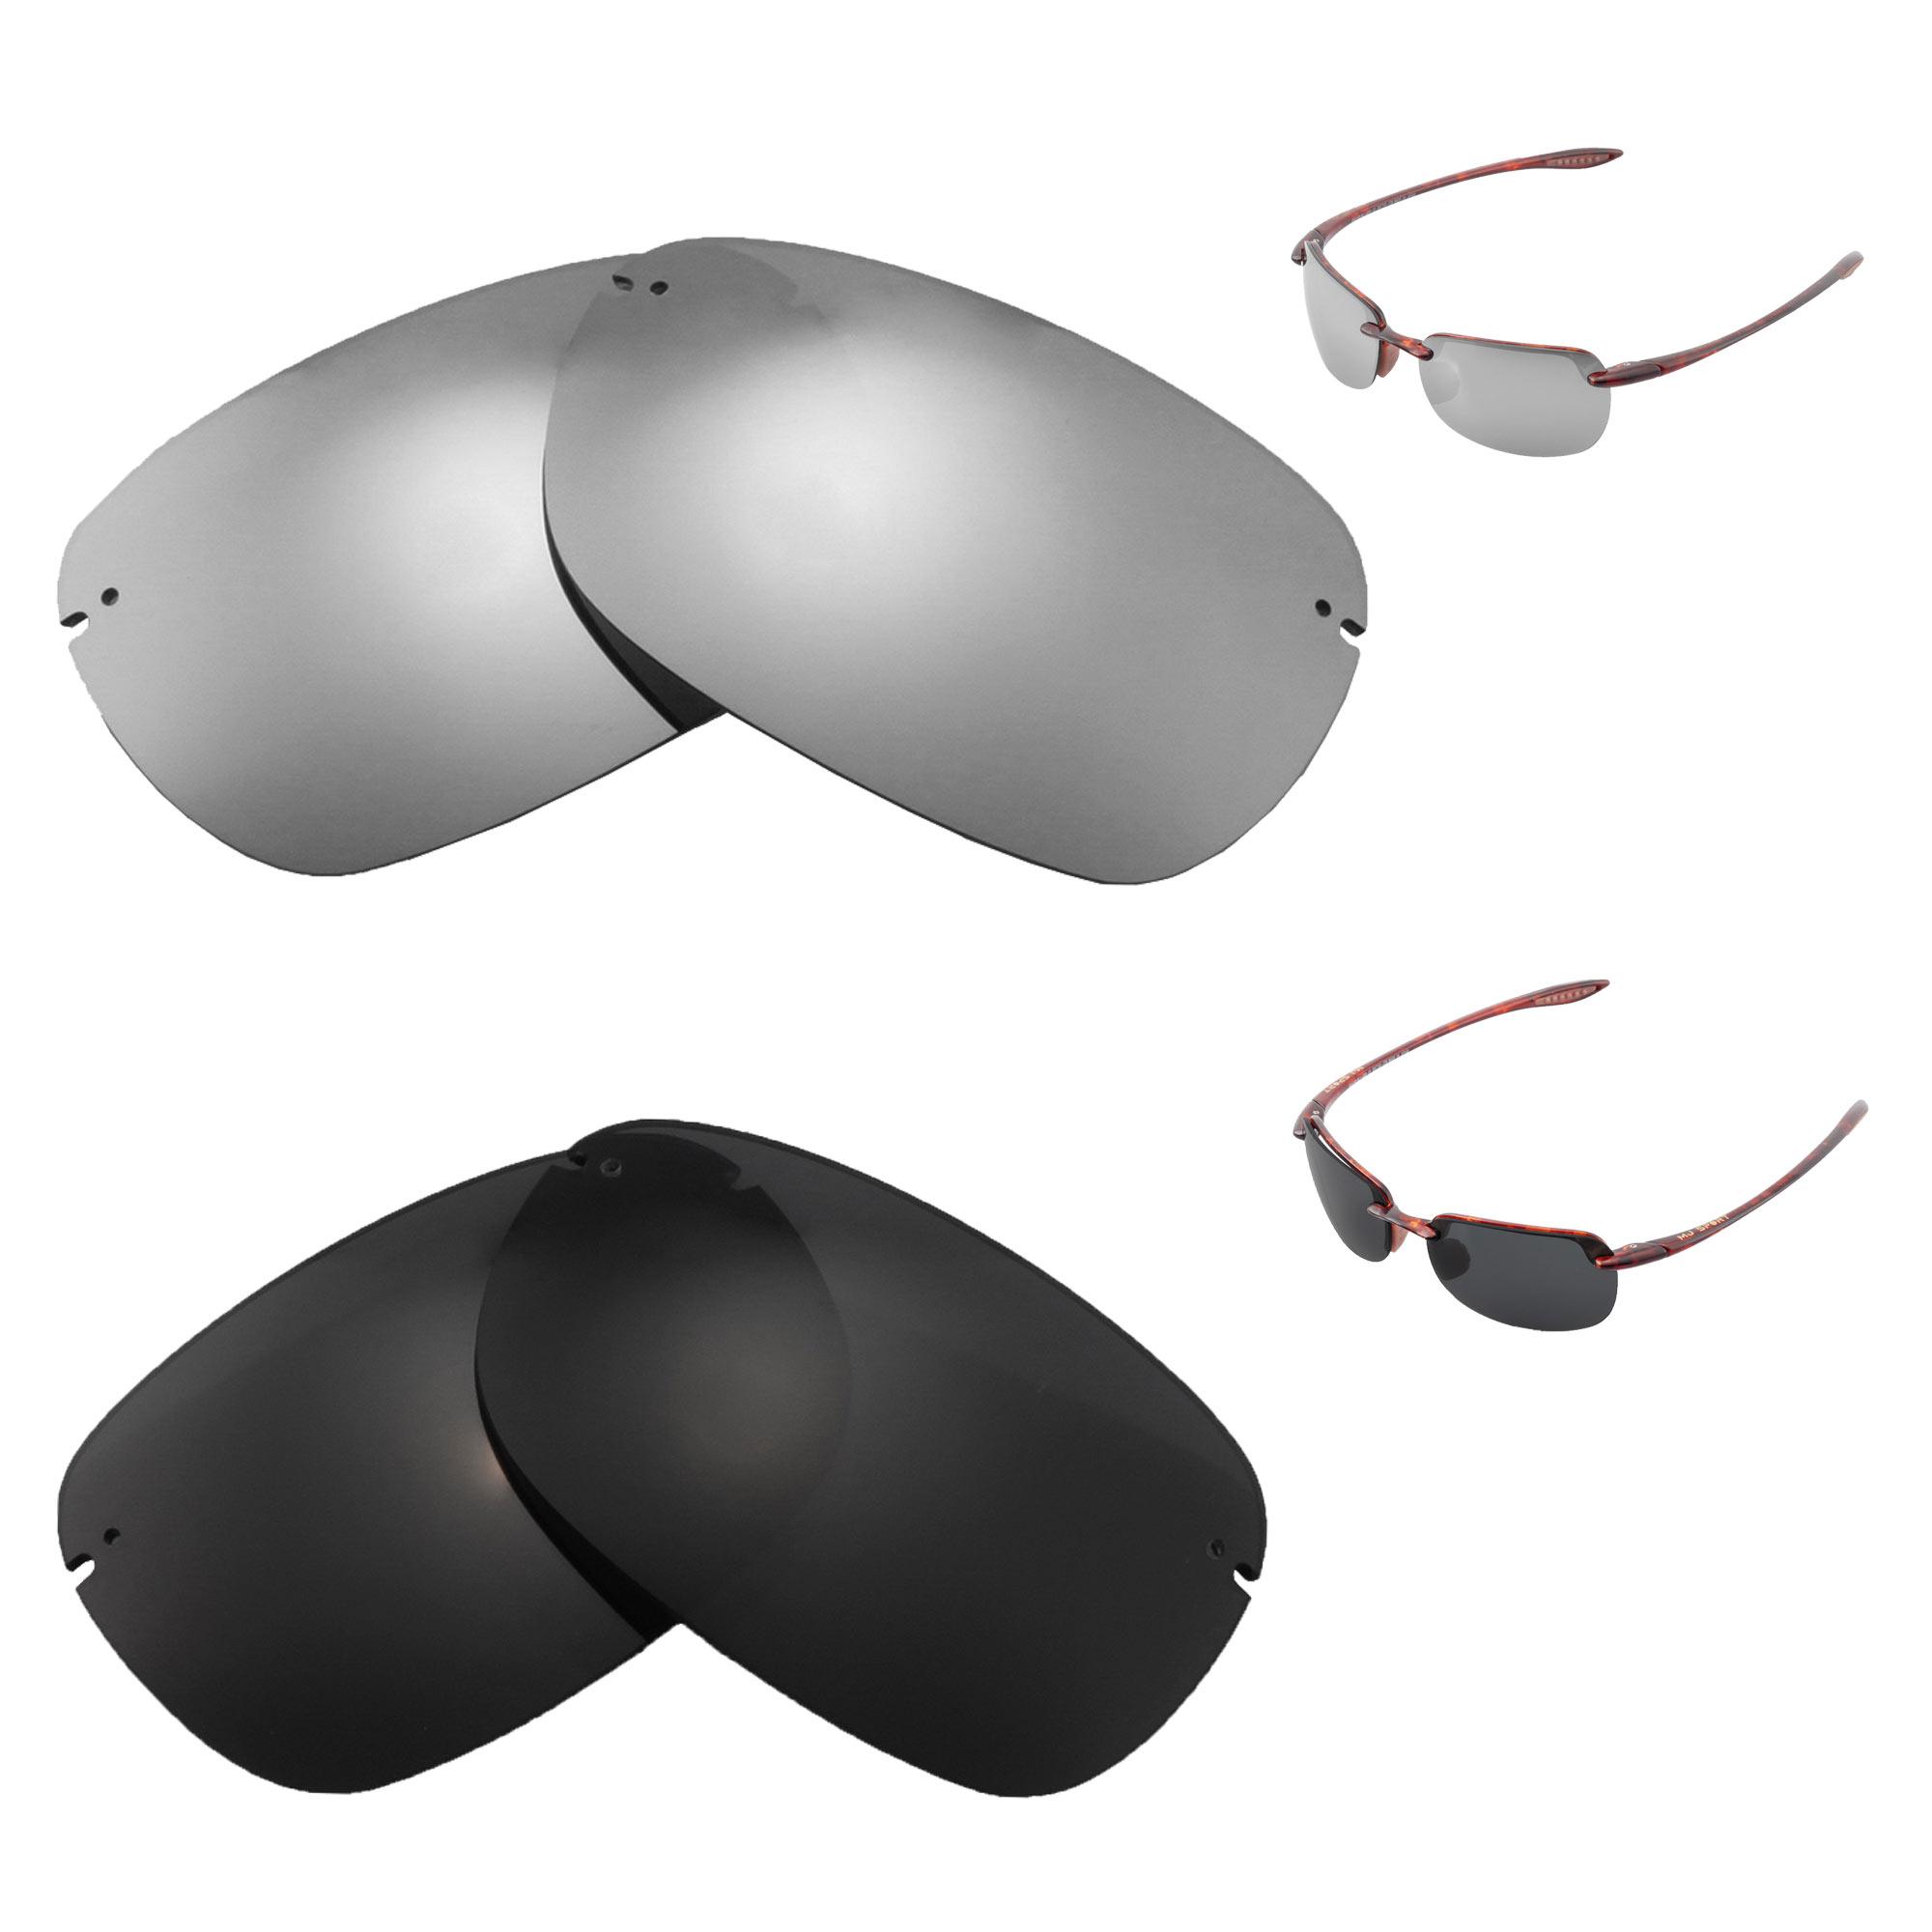 Fuse Lenses Non-Polarized Replacement Lenses for Maui Jim Guy Harvey Sailfish